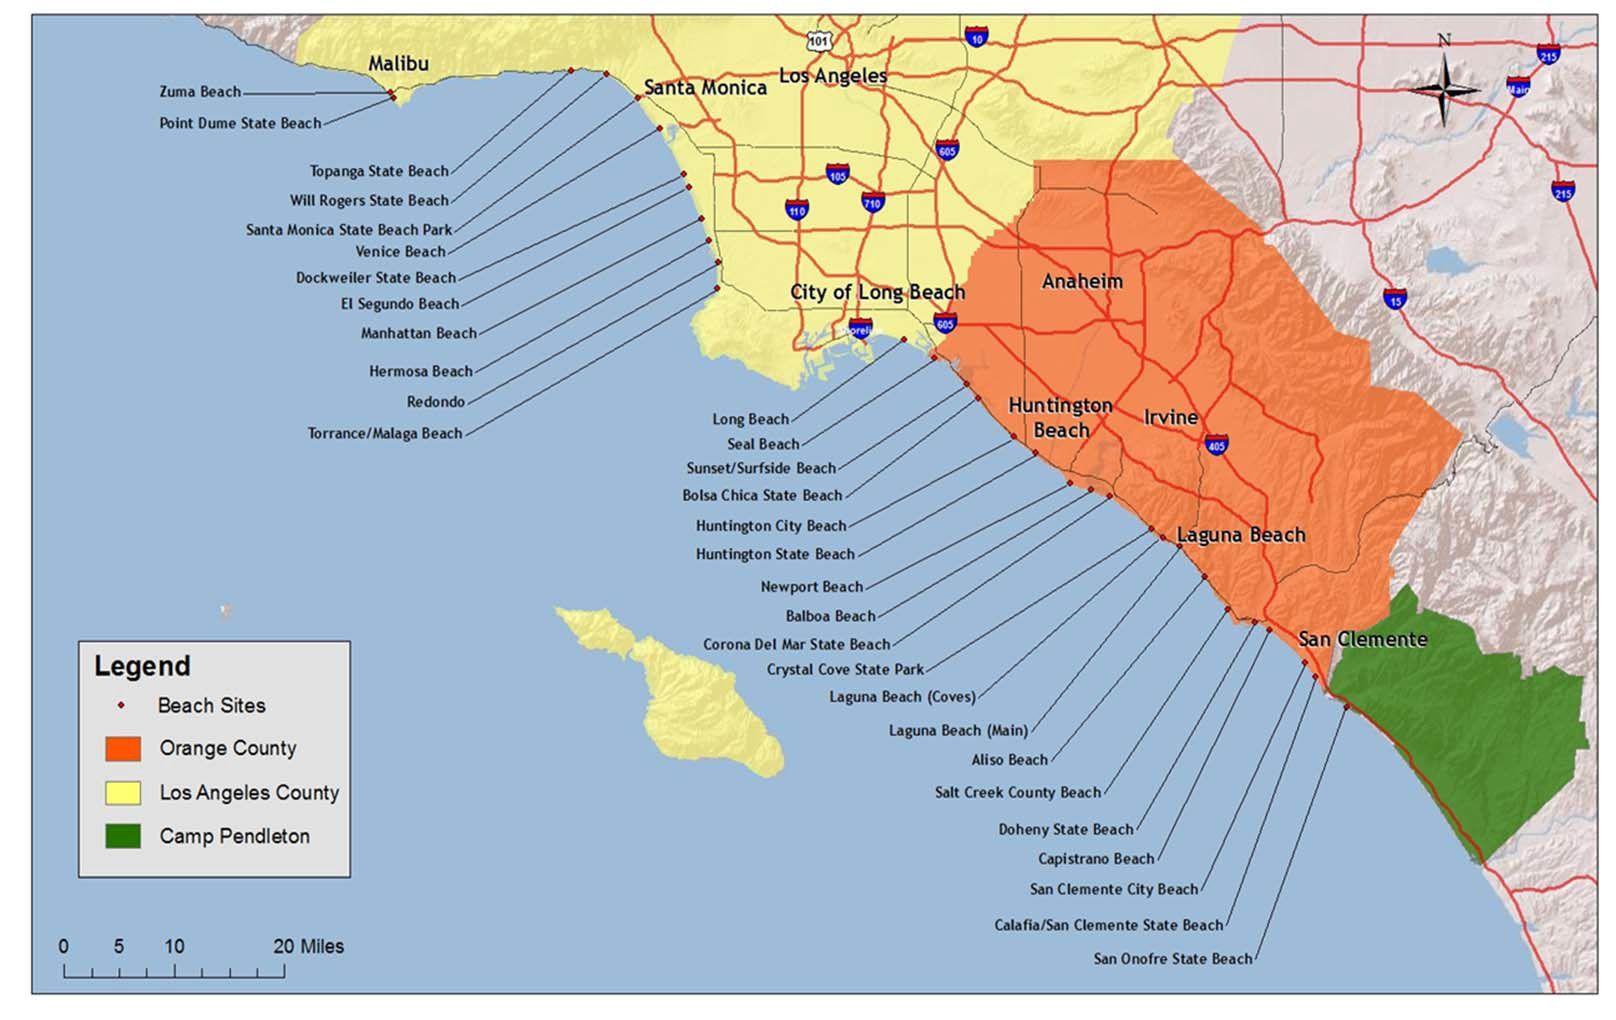 Map Of Southern California Coastal Towns.Map Of Southern California Beaches With Images Southern